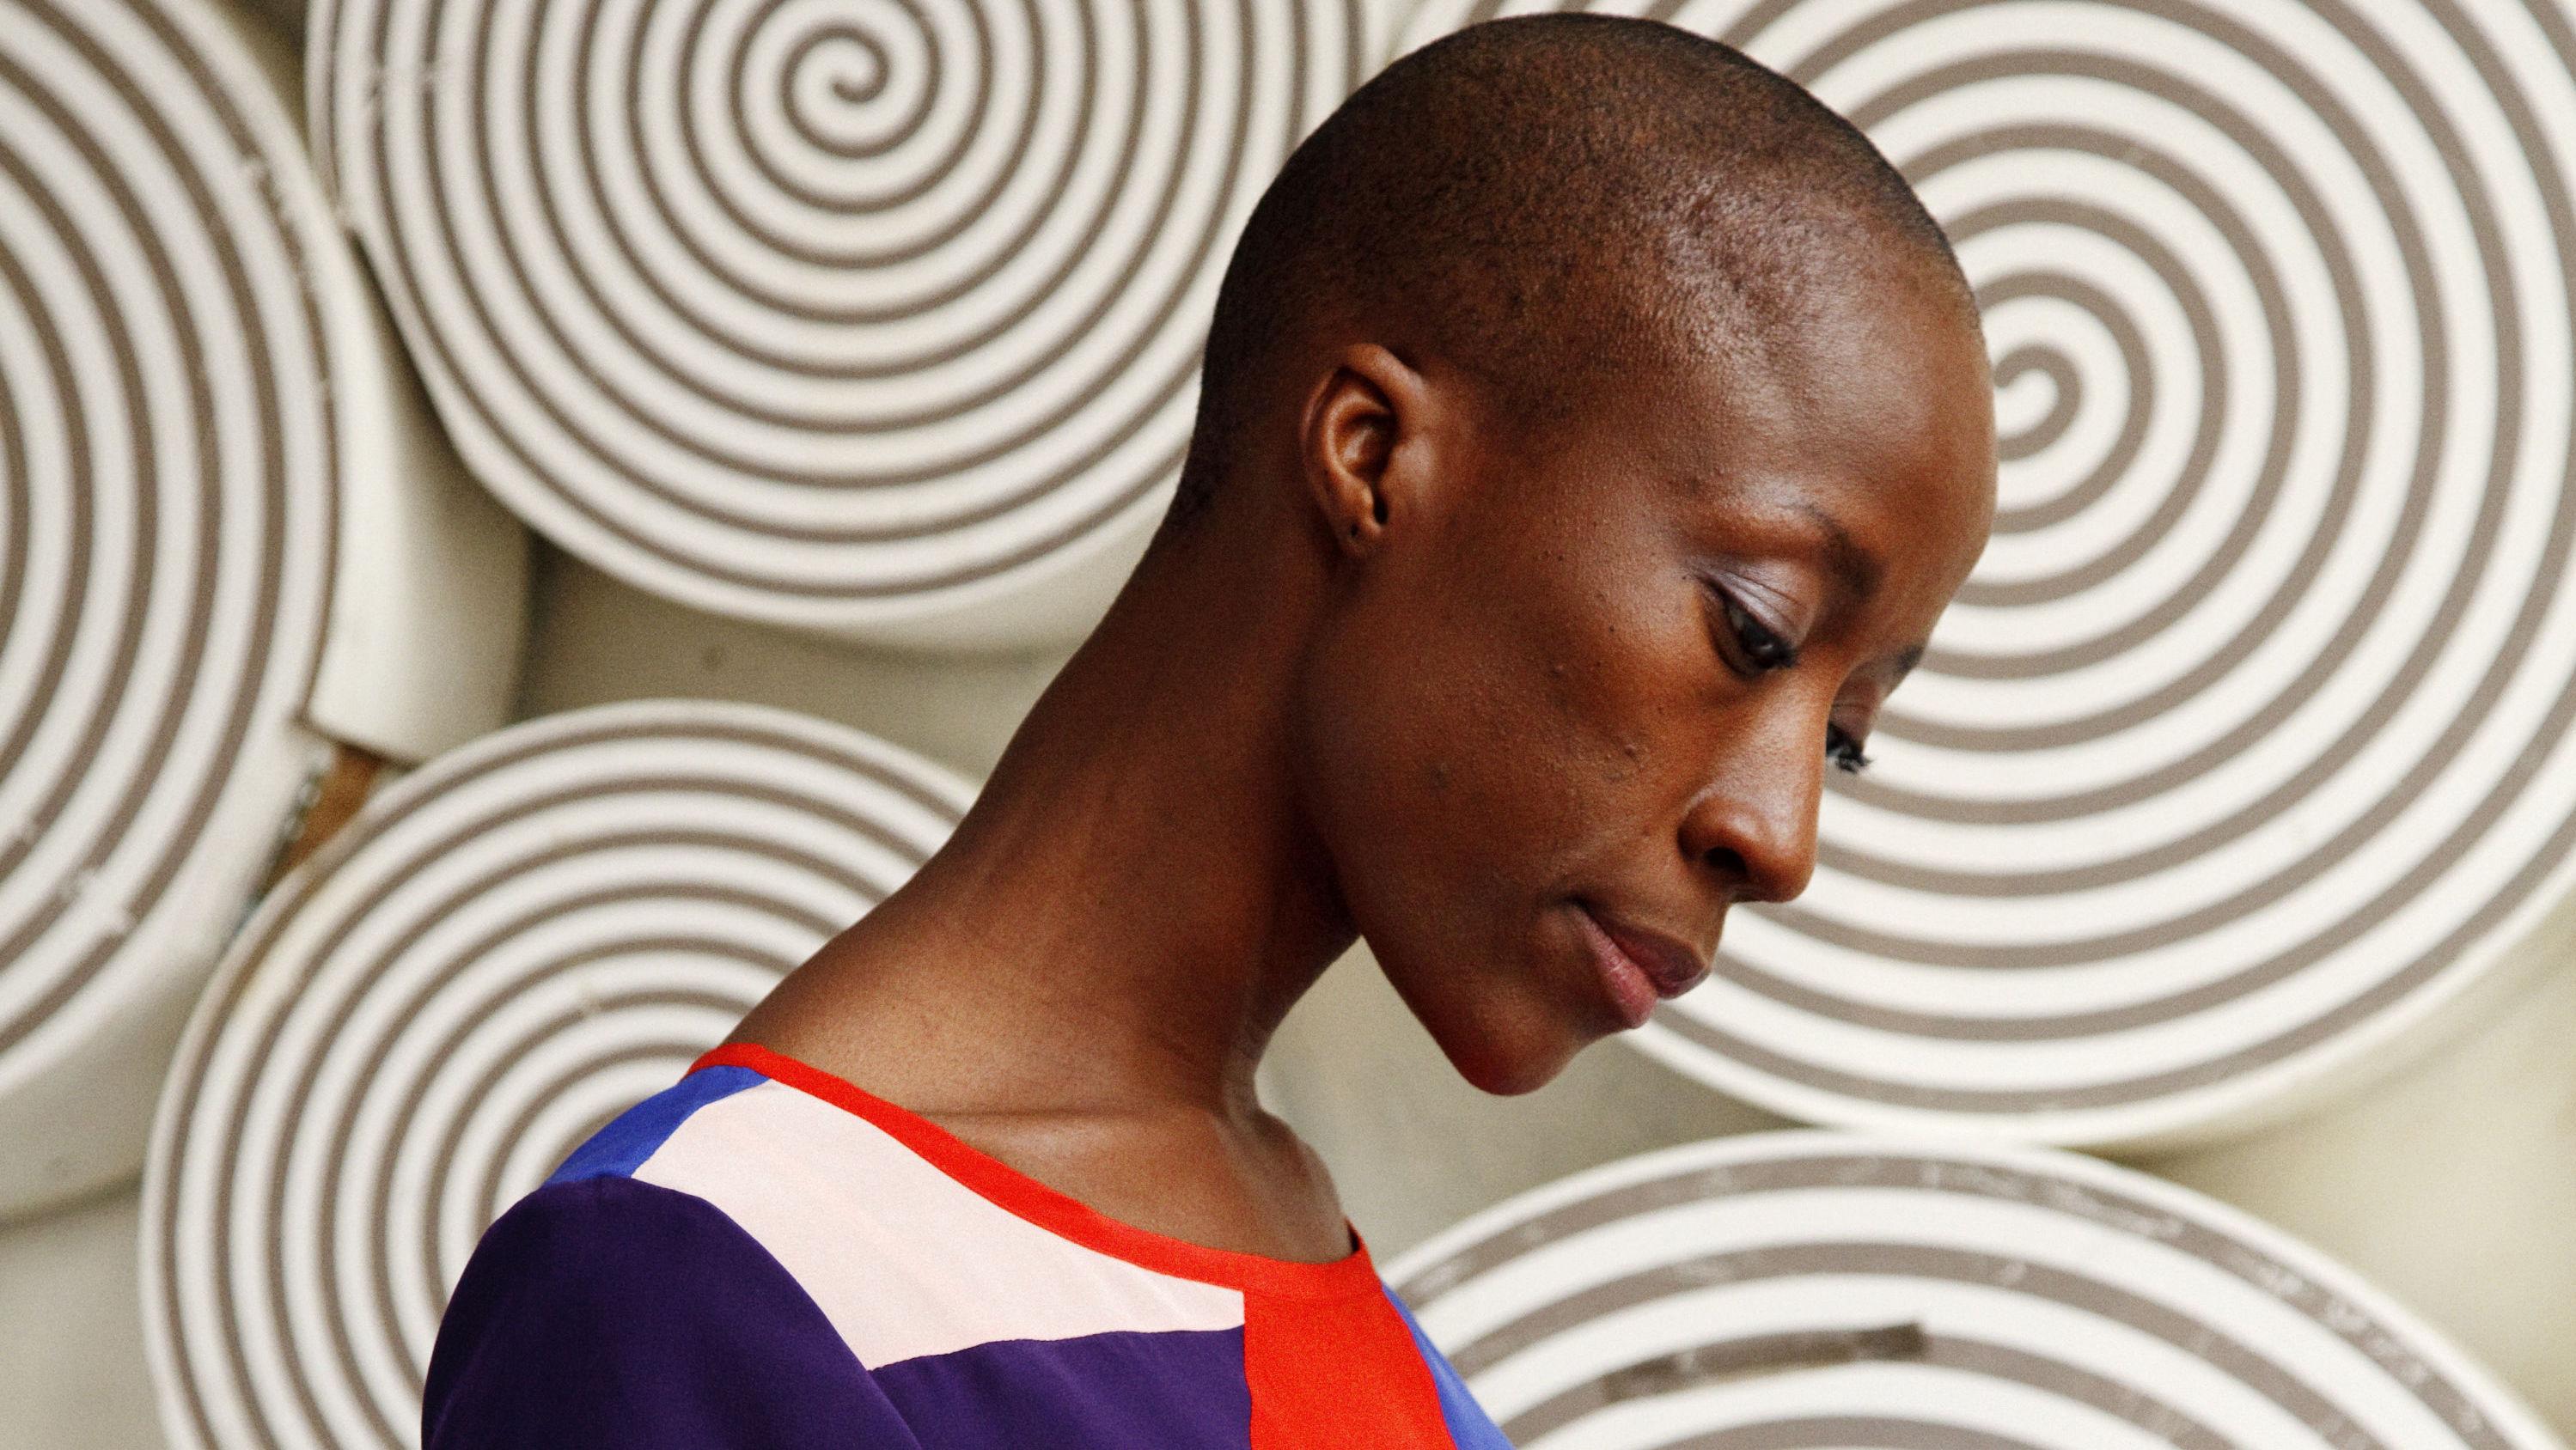 Rokia Traoré On Taking Up Music, And Mali's 'Iron Women'